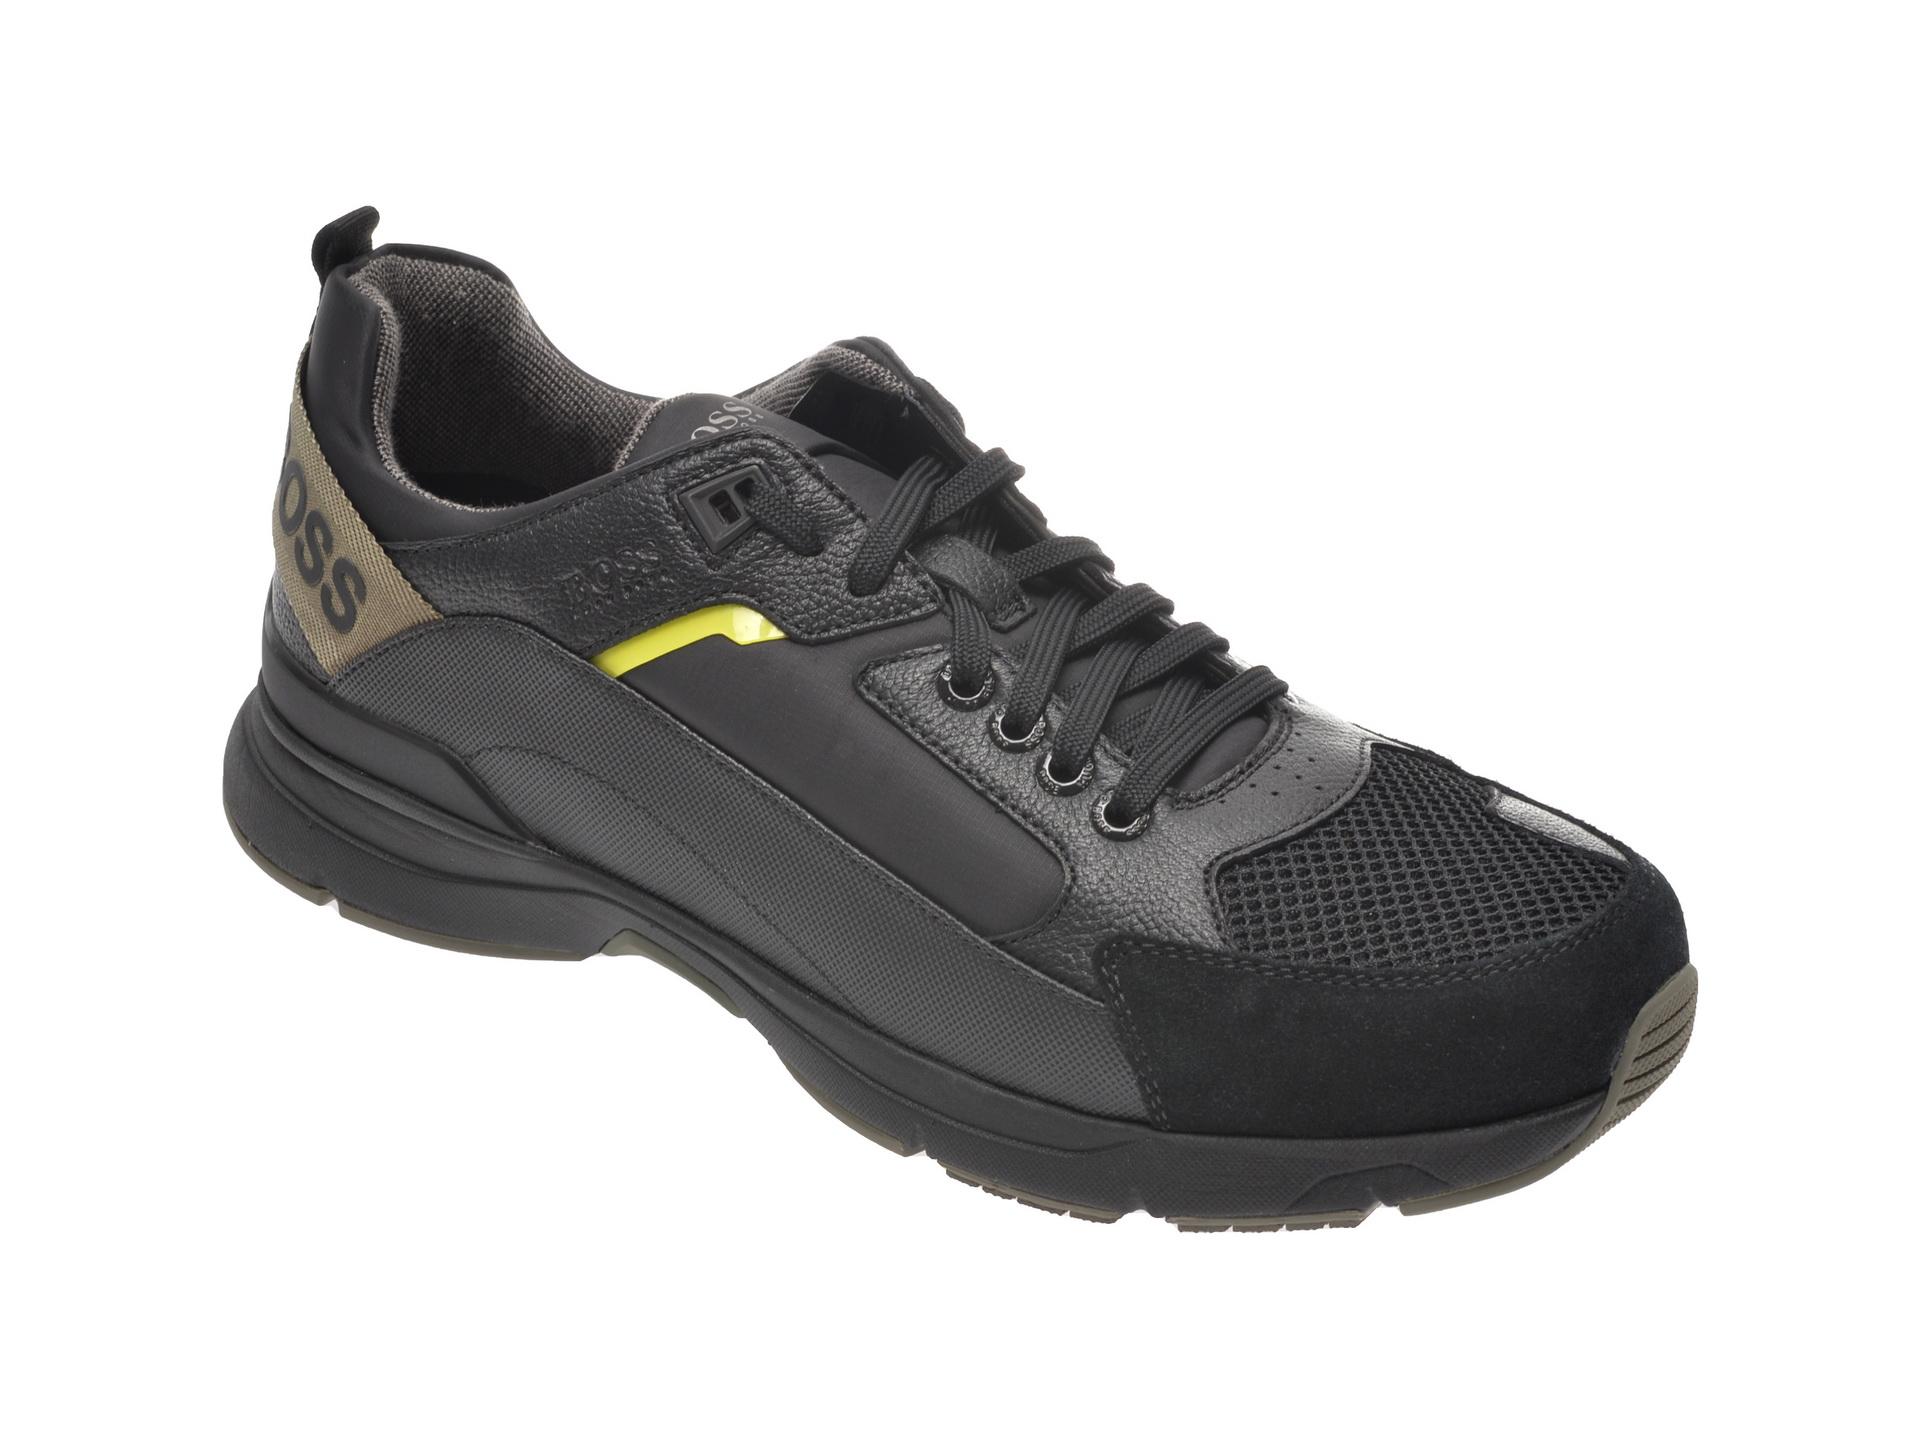 Pantofi sport HUGO BOSS negri, 8547, din material textil si piele naturala